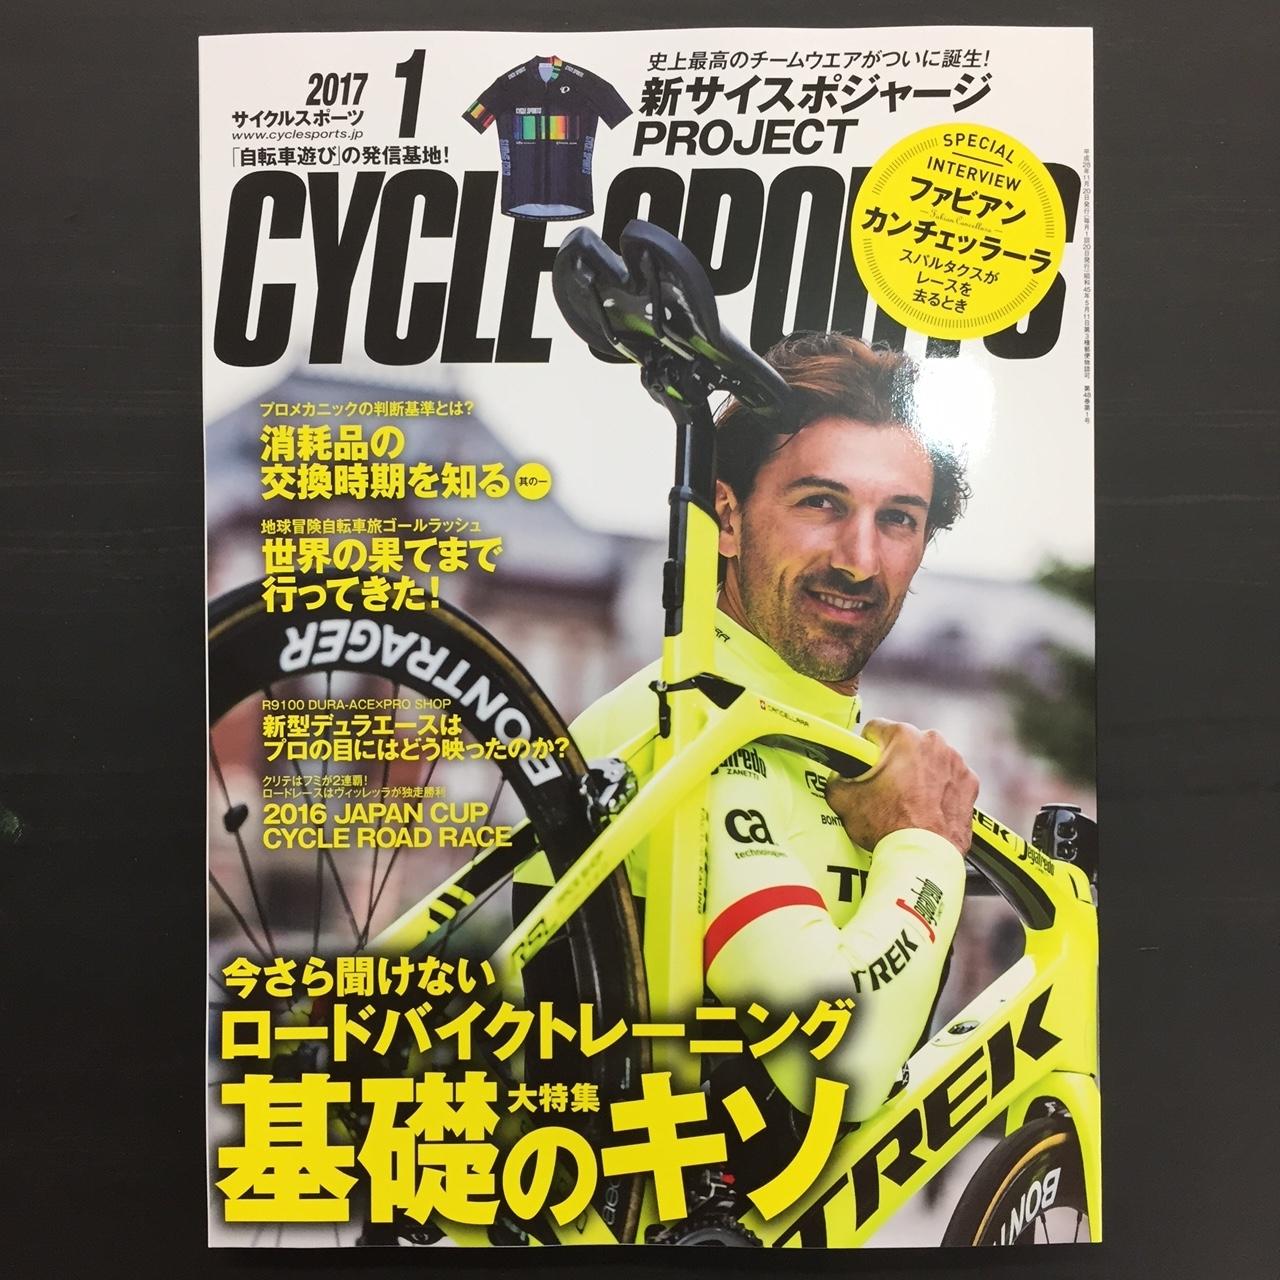 CycleSport-2017-1-1.jpg